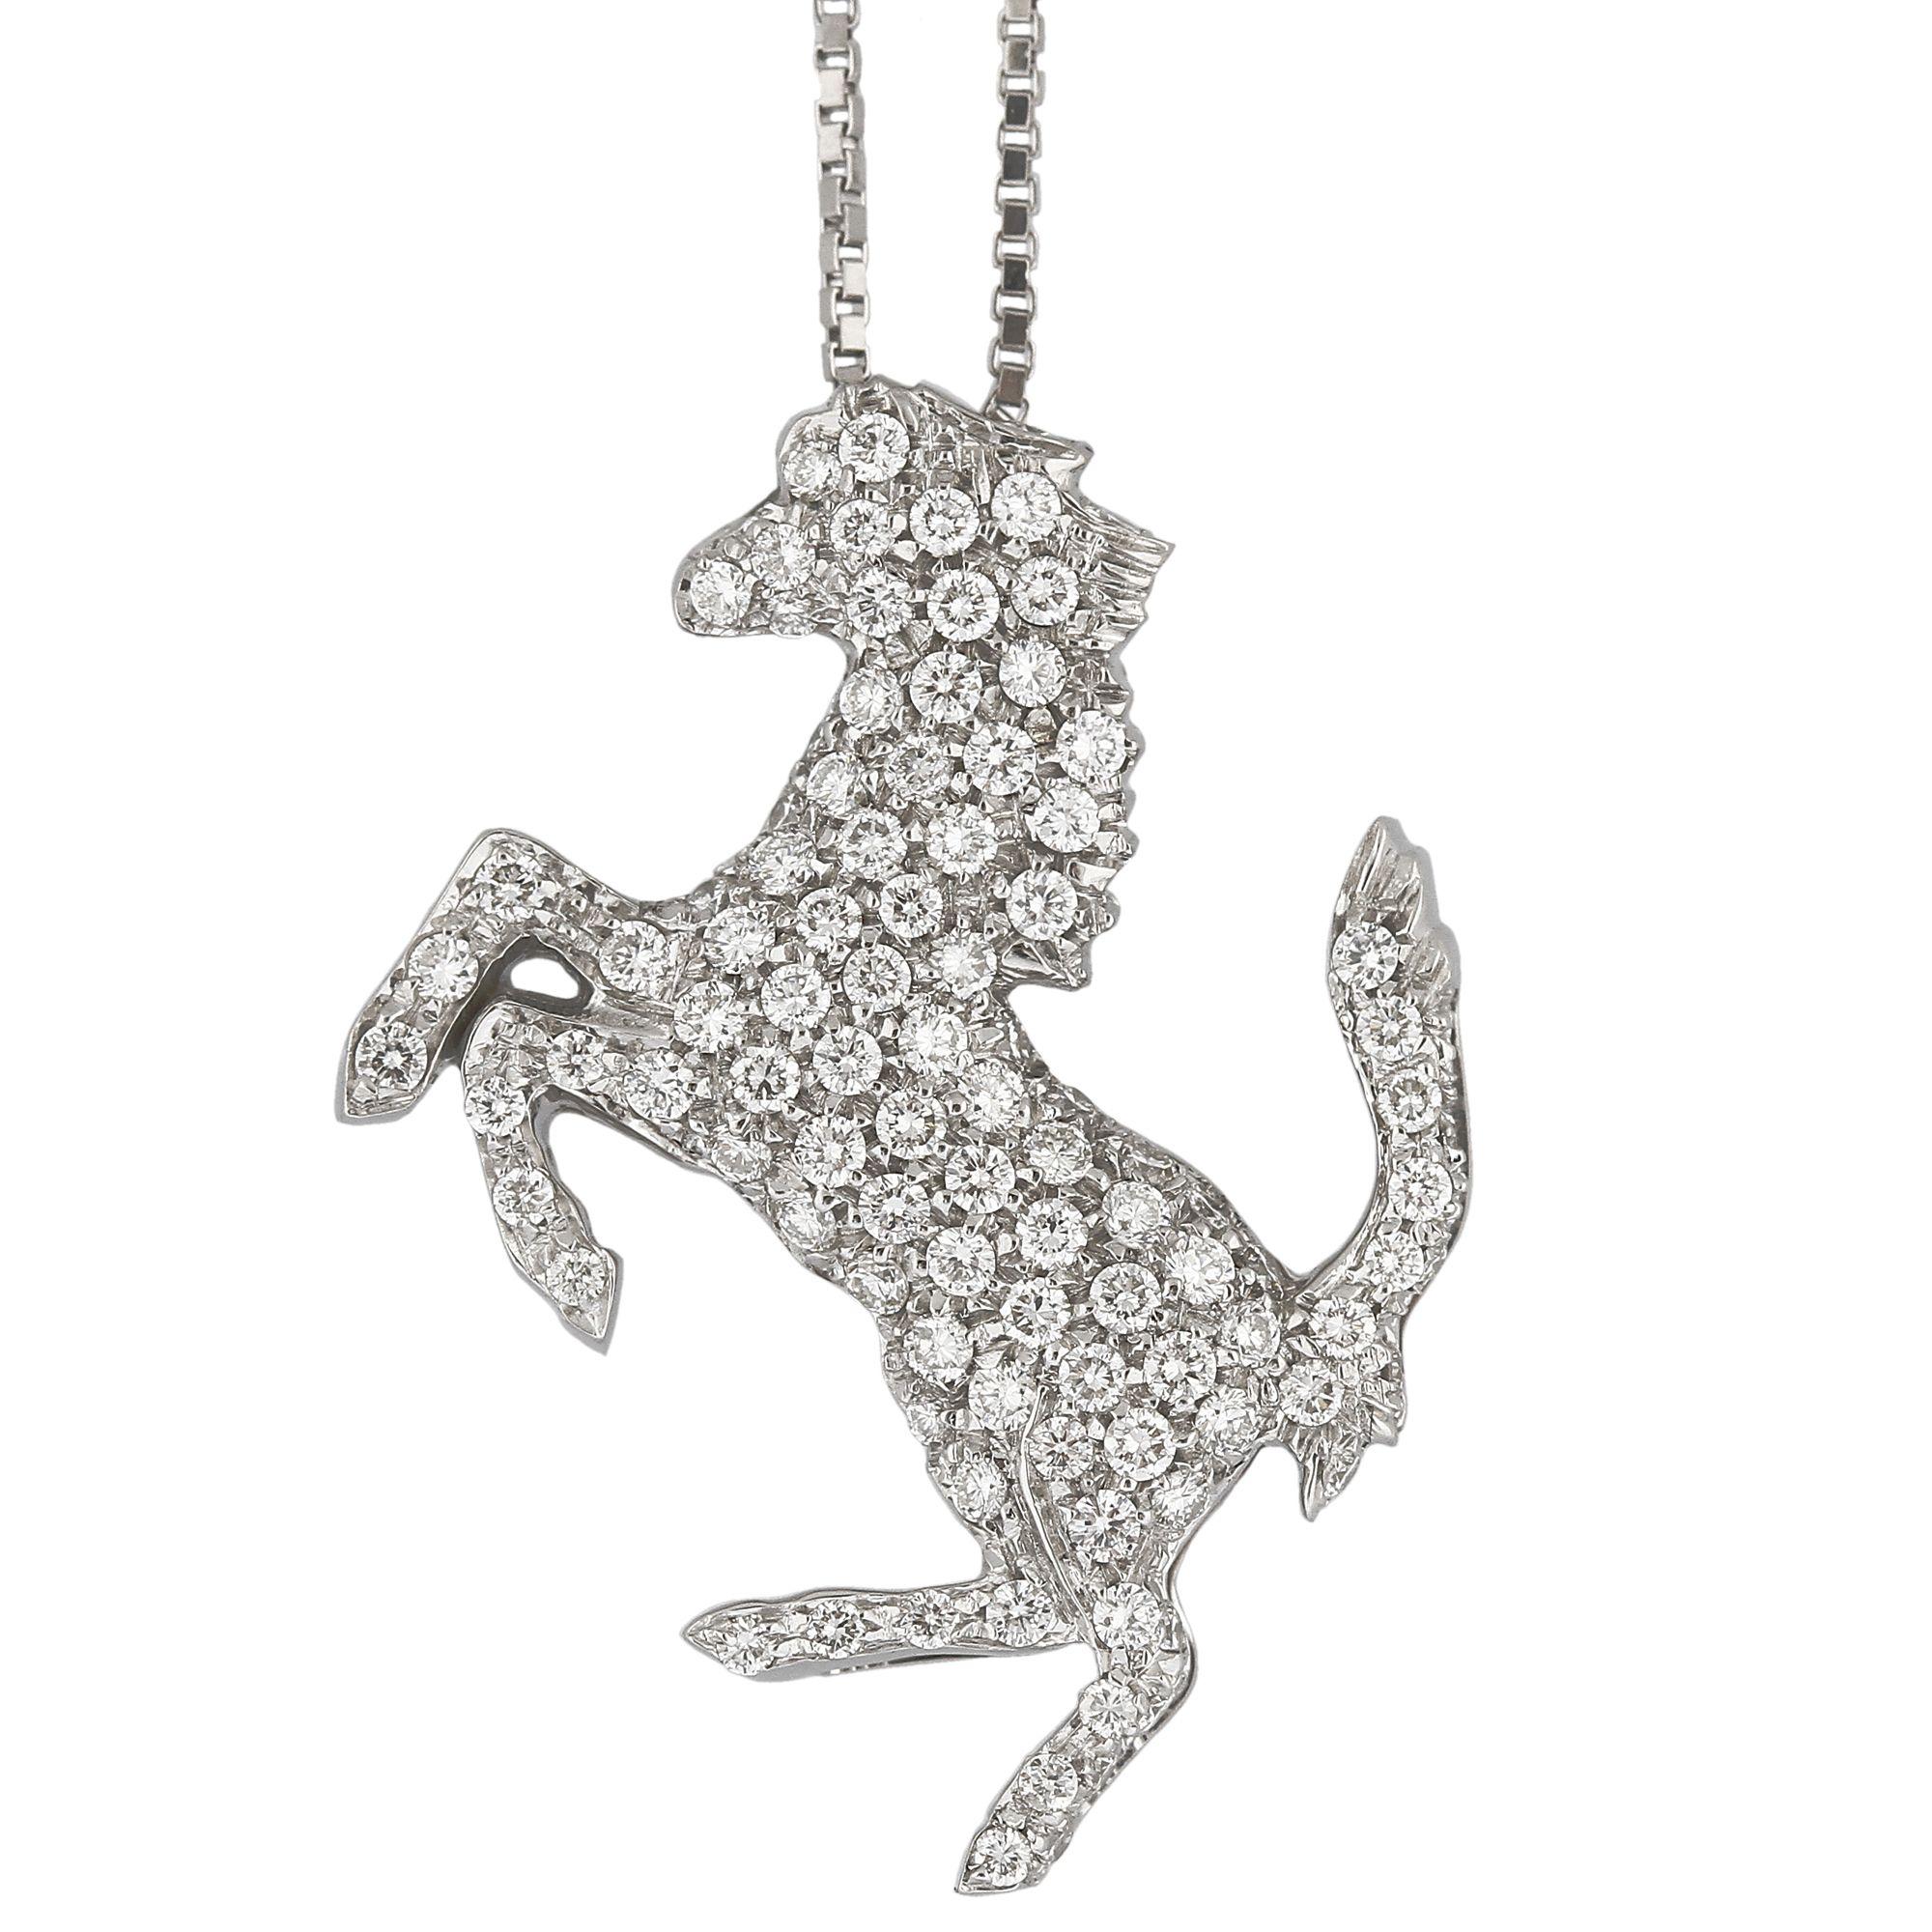 rose jewelry in ferrari necklace pendant chopard diamond gold